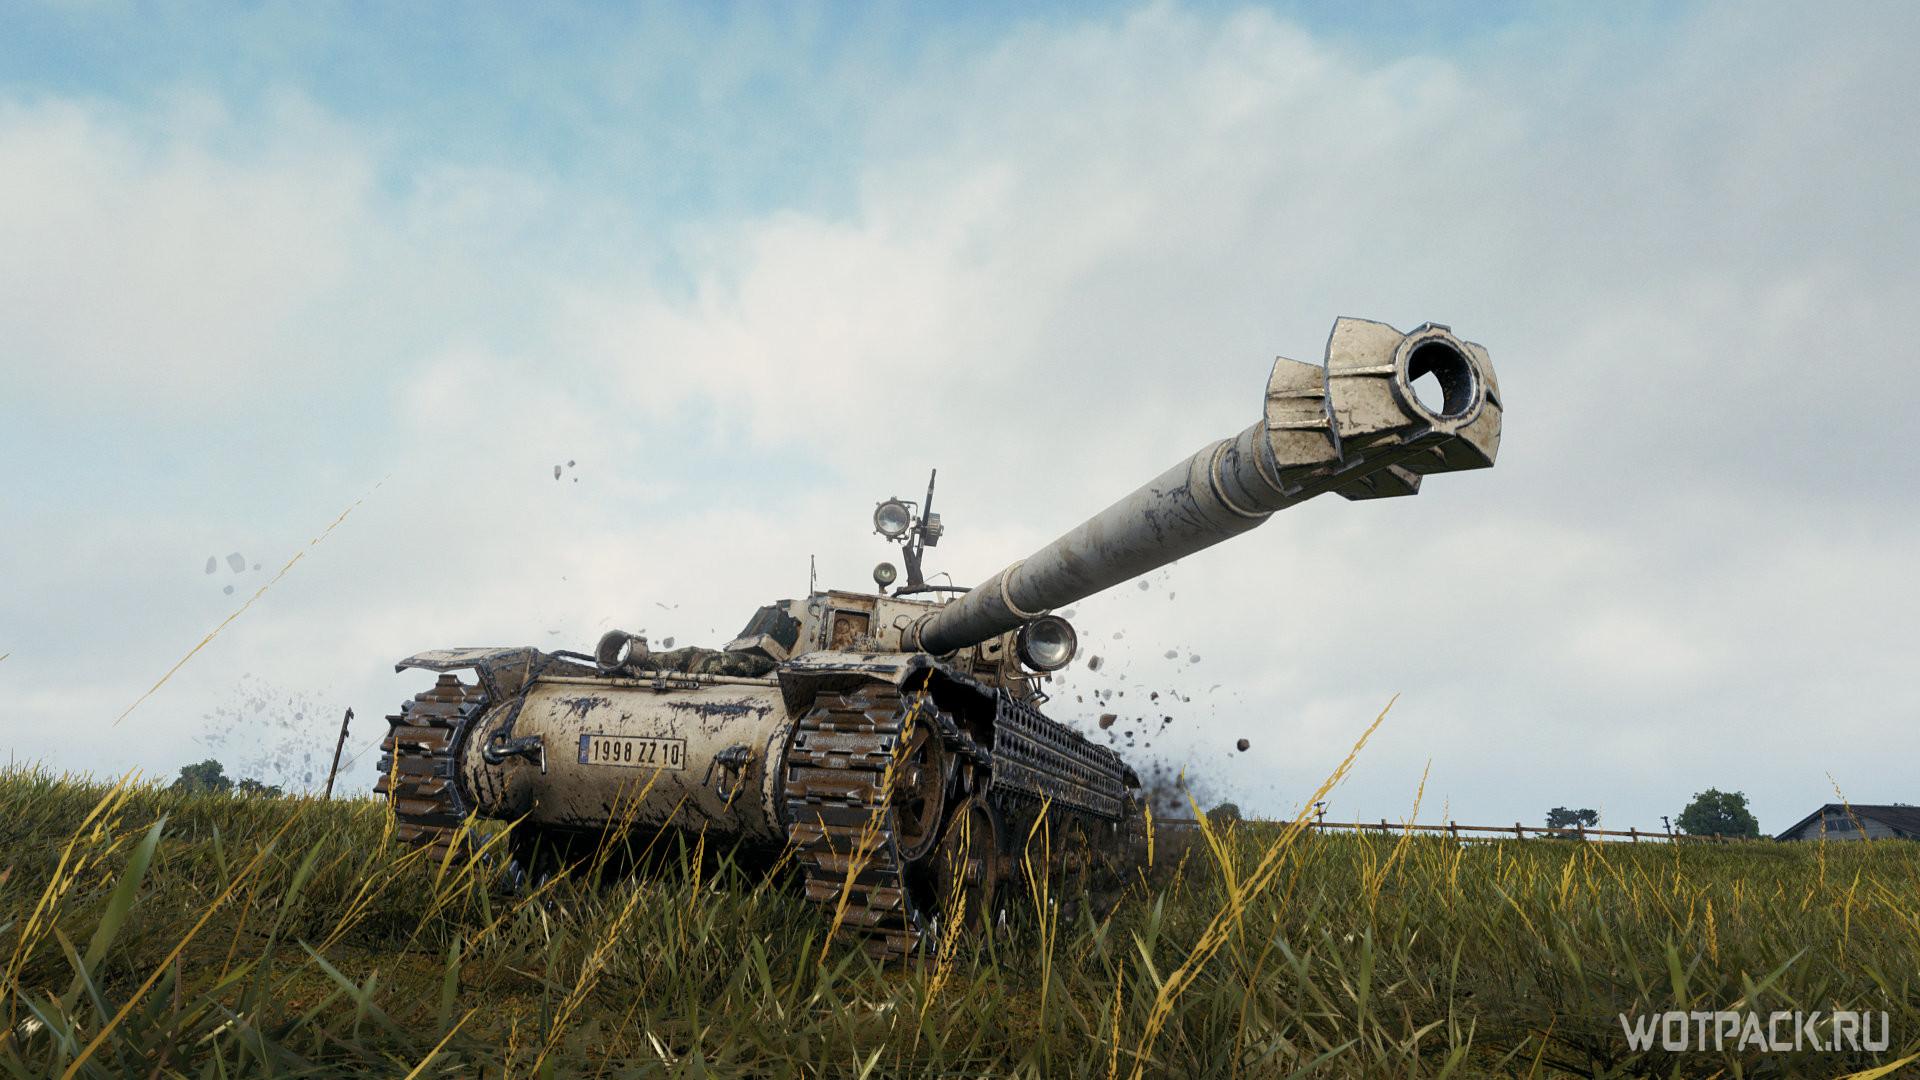 💥Подарок на 23 февраля — прем танк 8 уровня за марафон в WoT!💥